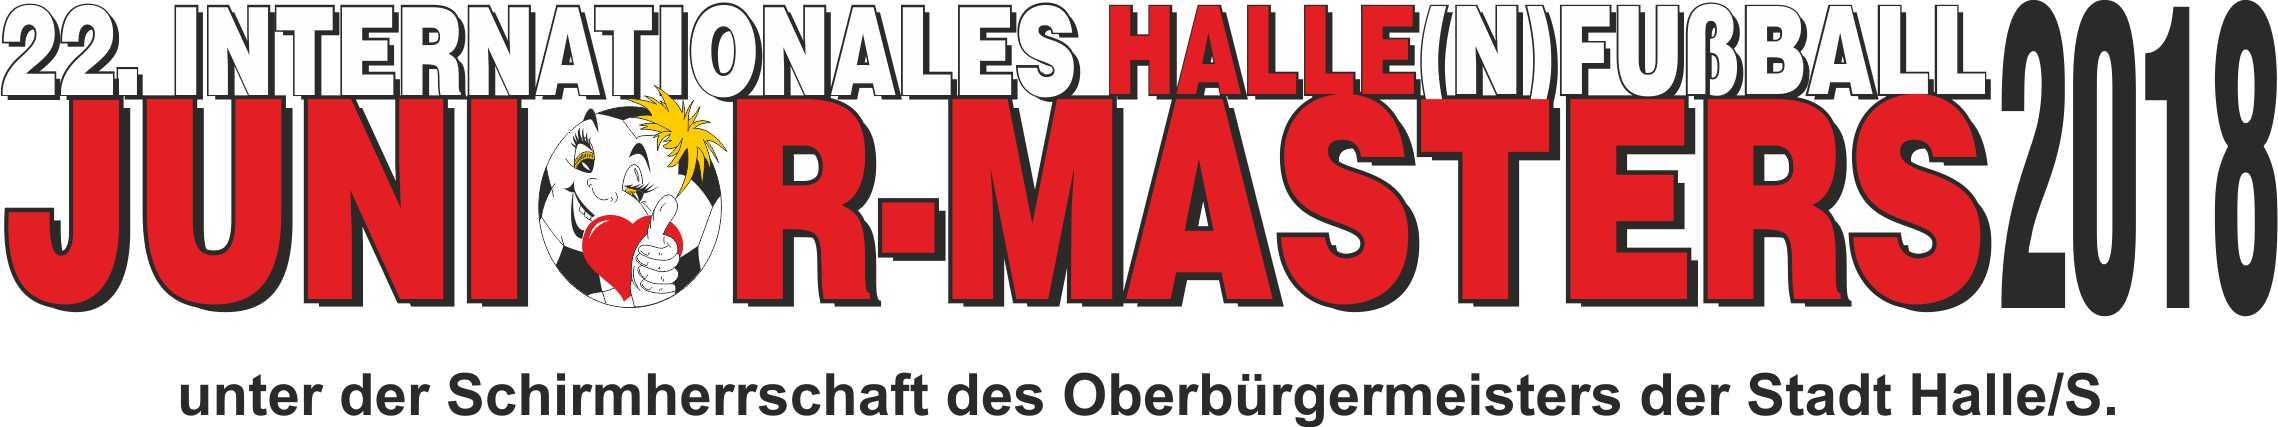 HALLE(N)FUSSBALL JUNIOR-MASTERS